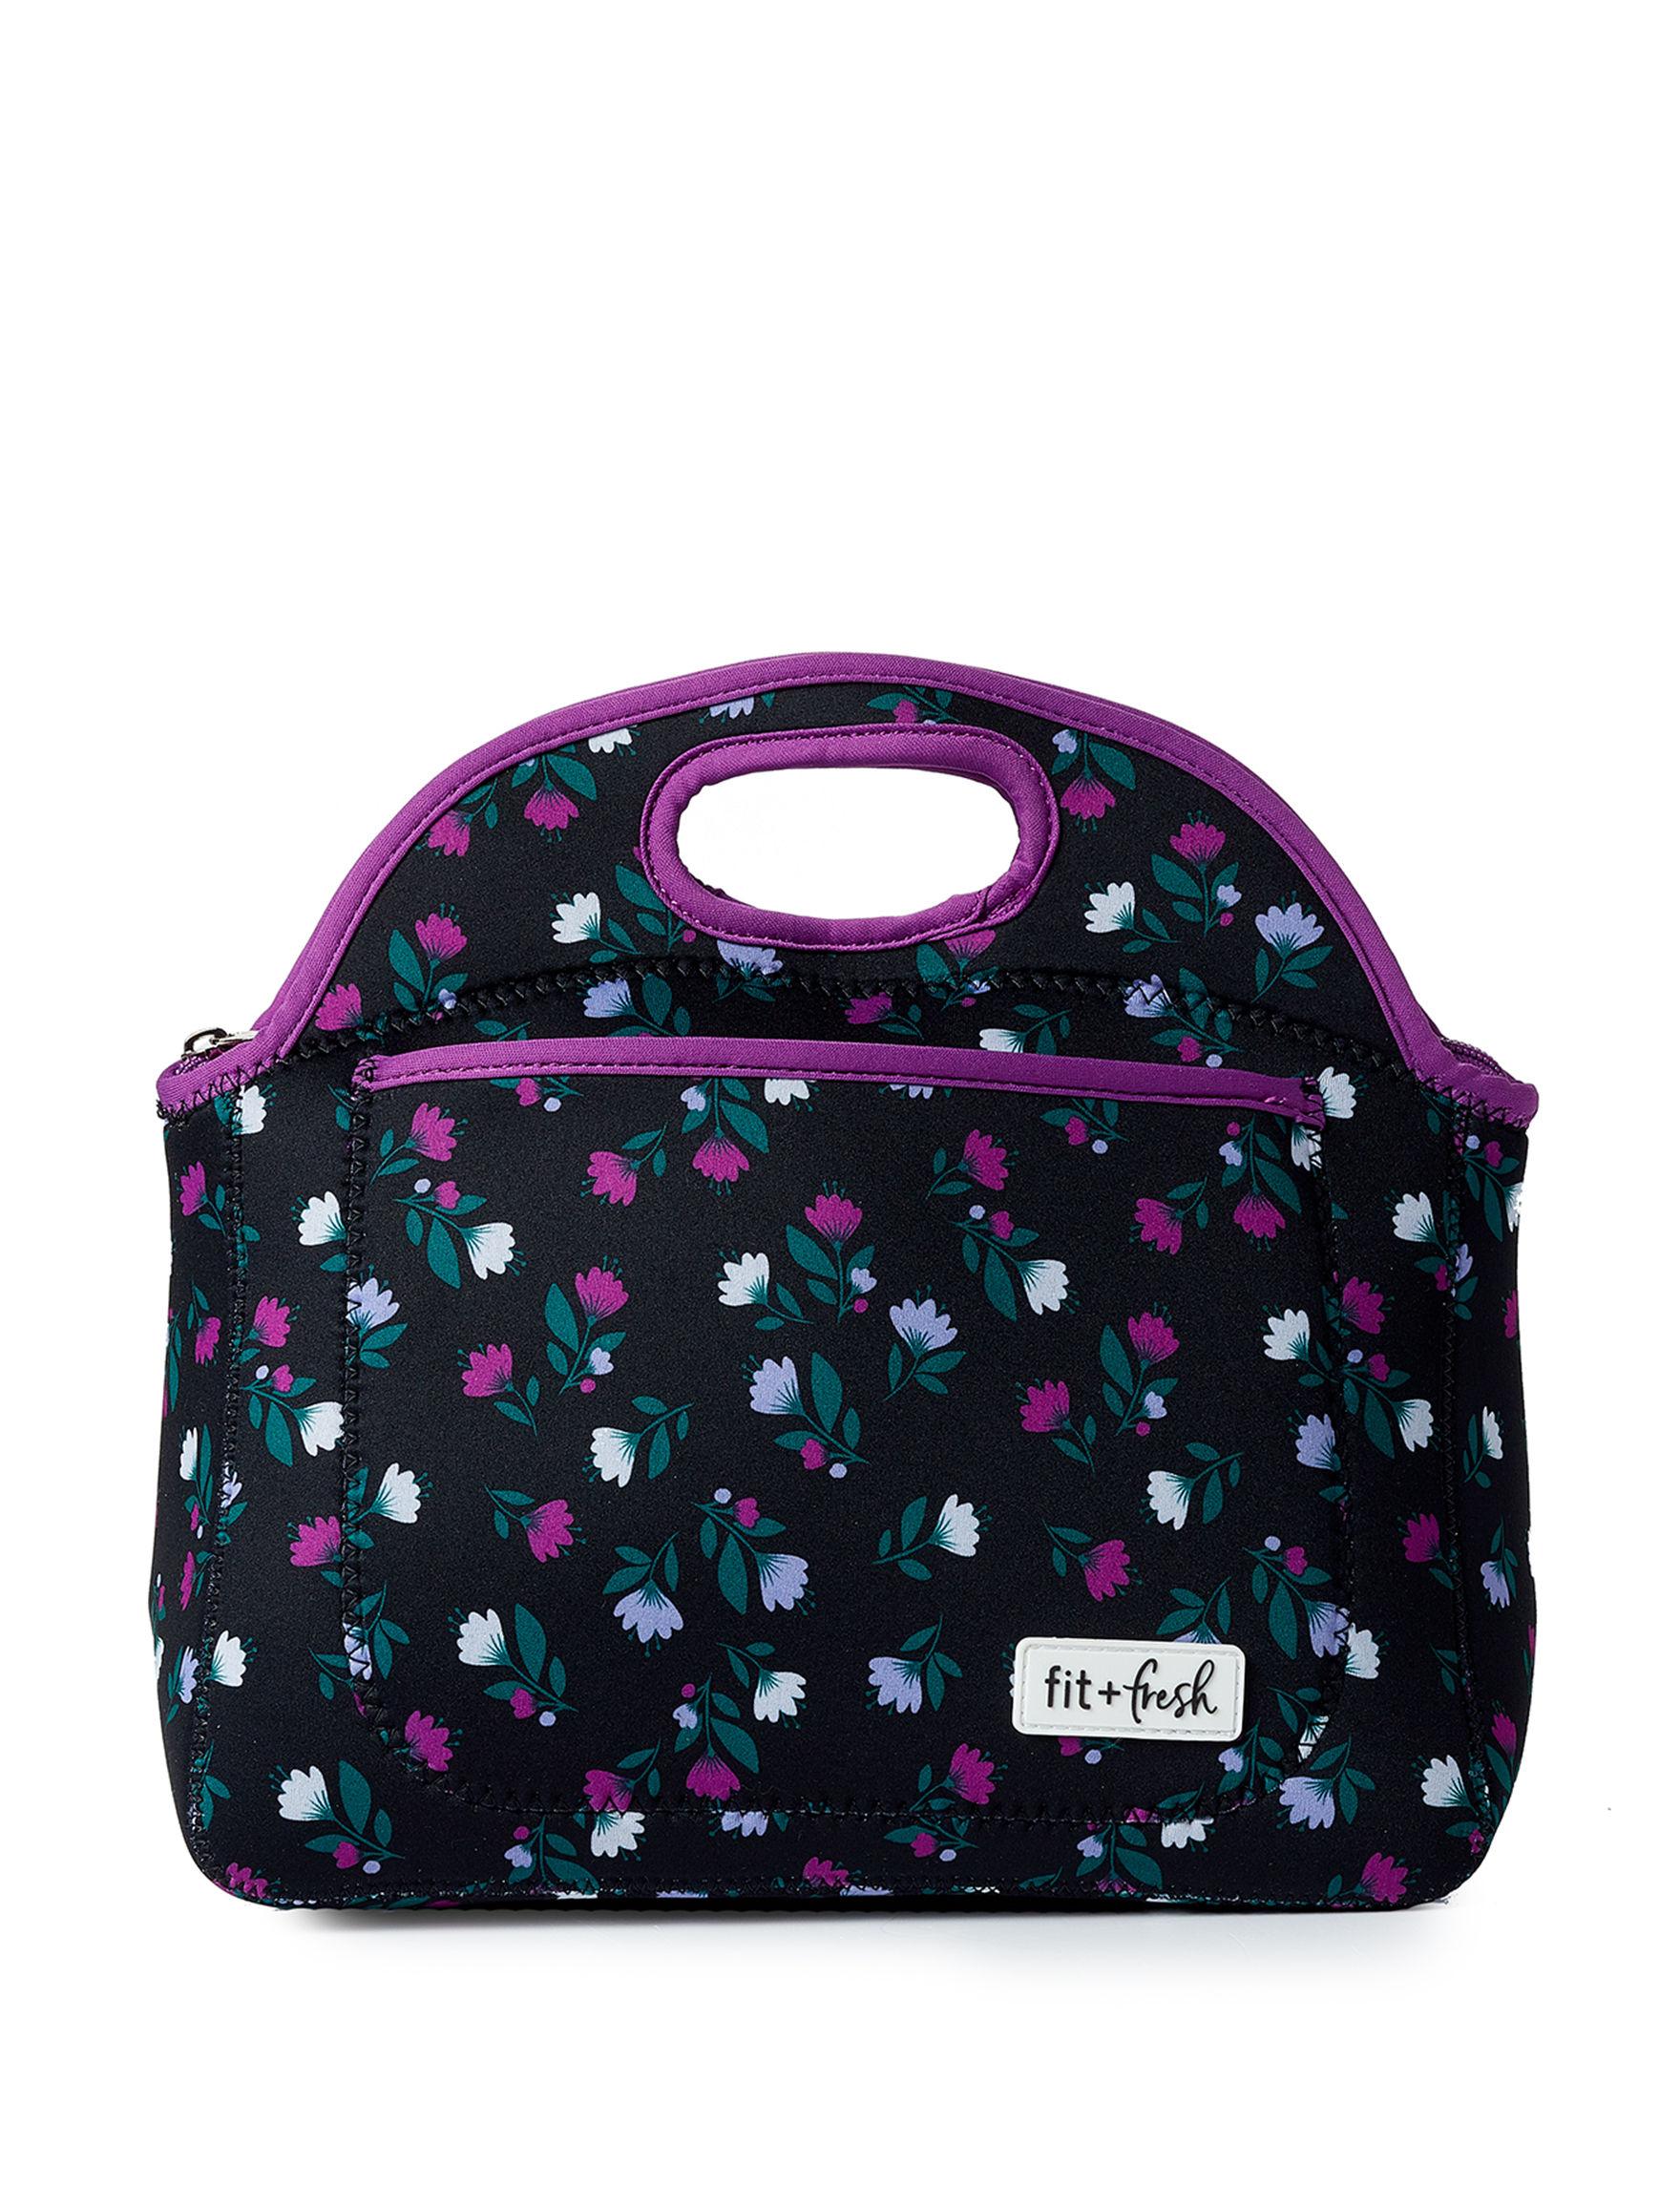 Fit & Fresh Black Floral Lunch Boxes & Bags Kitchen Storage & Organization